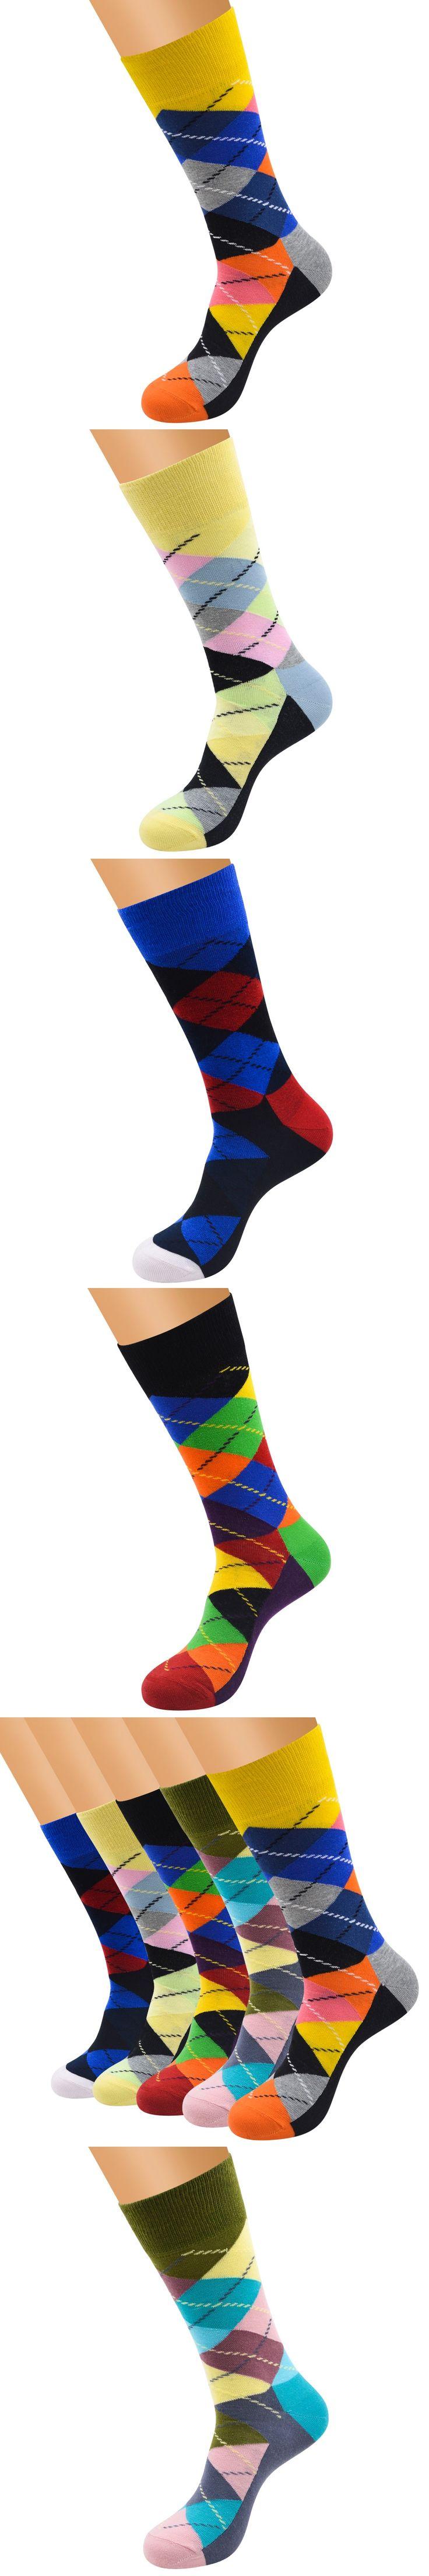 Colored Diamond Jacquard High Socks For Men Gentlemen British Popular Stockings Man Street Harajuku Sock Festival Gift Socks